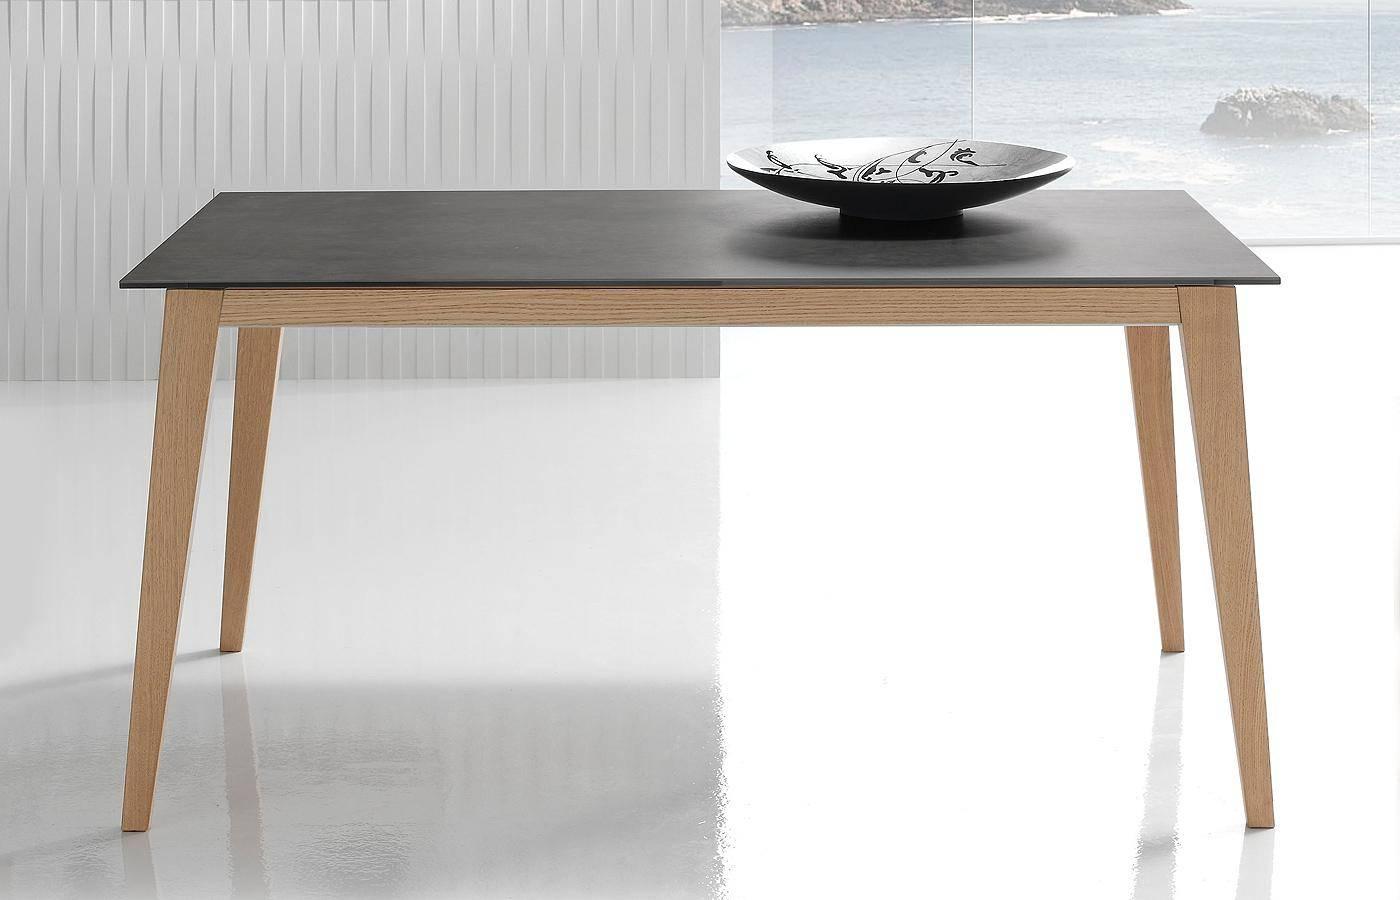 Mesa de comedor oko porcel nico dismobel - Imagenes de mesas de comedor ...